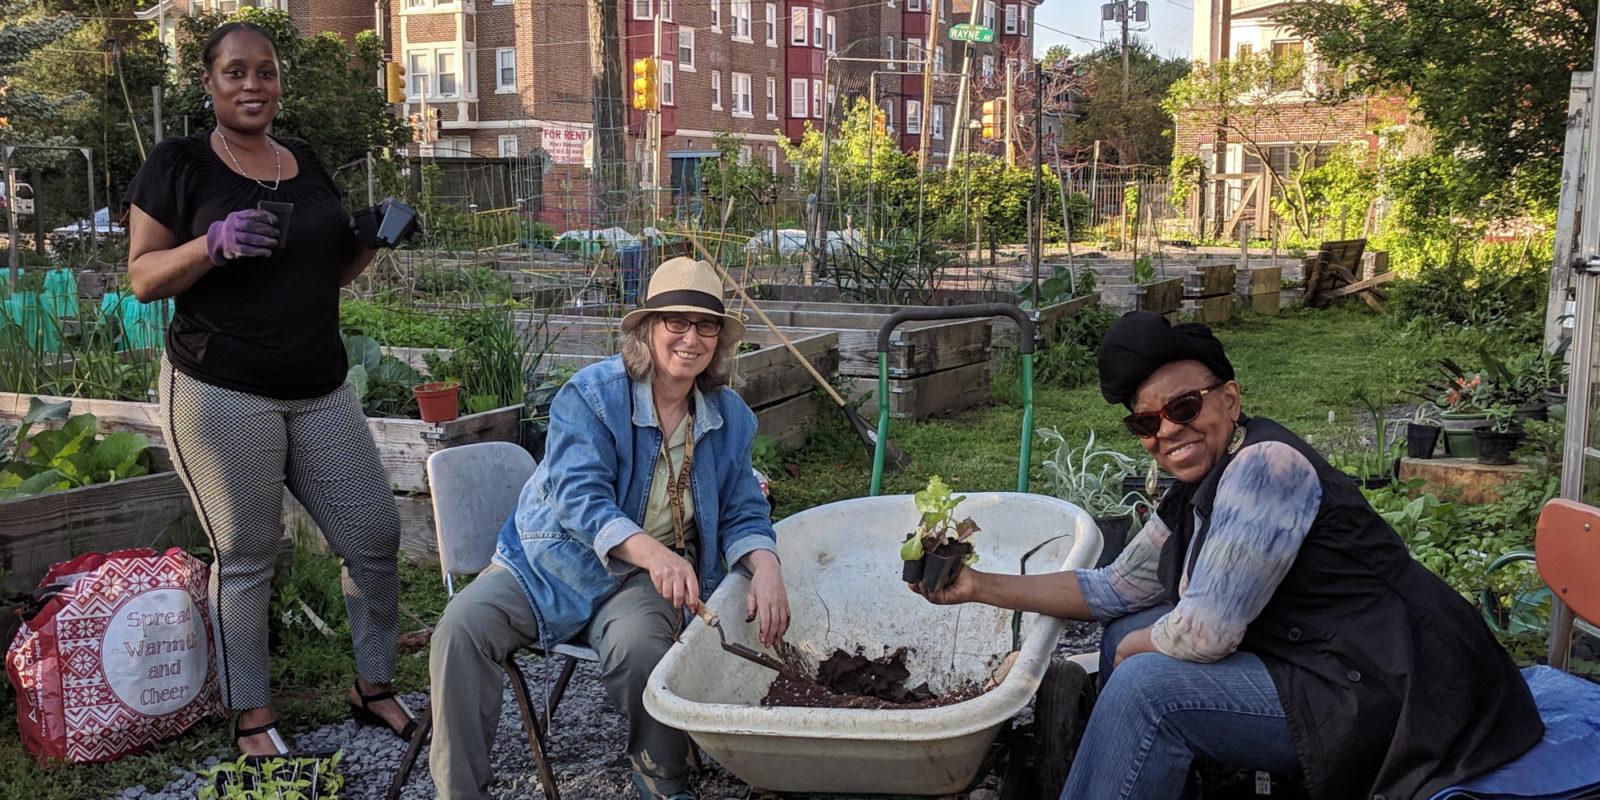 3 women potting plants at a wheelbarrow